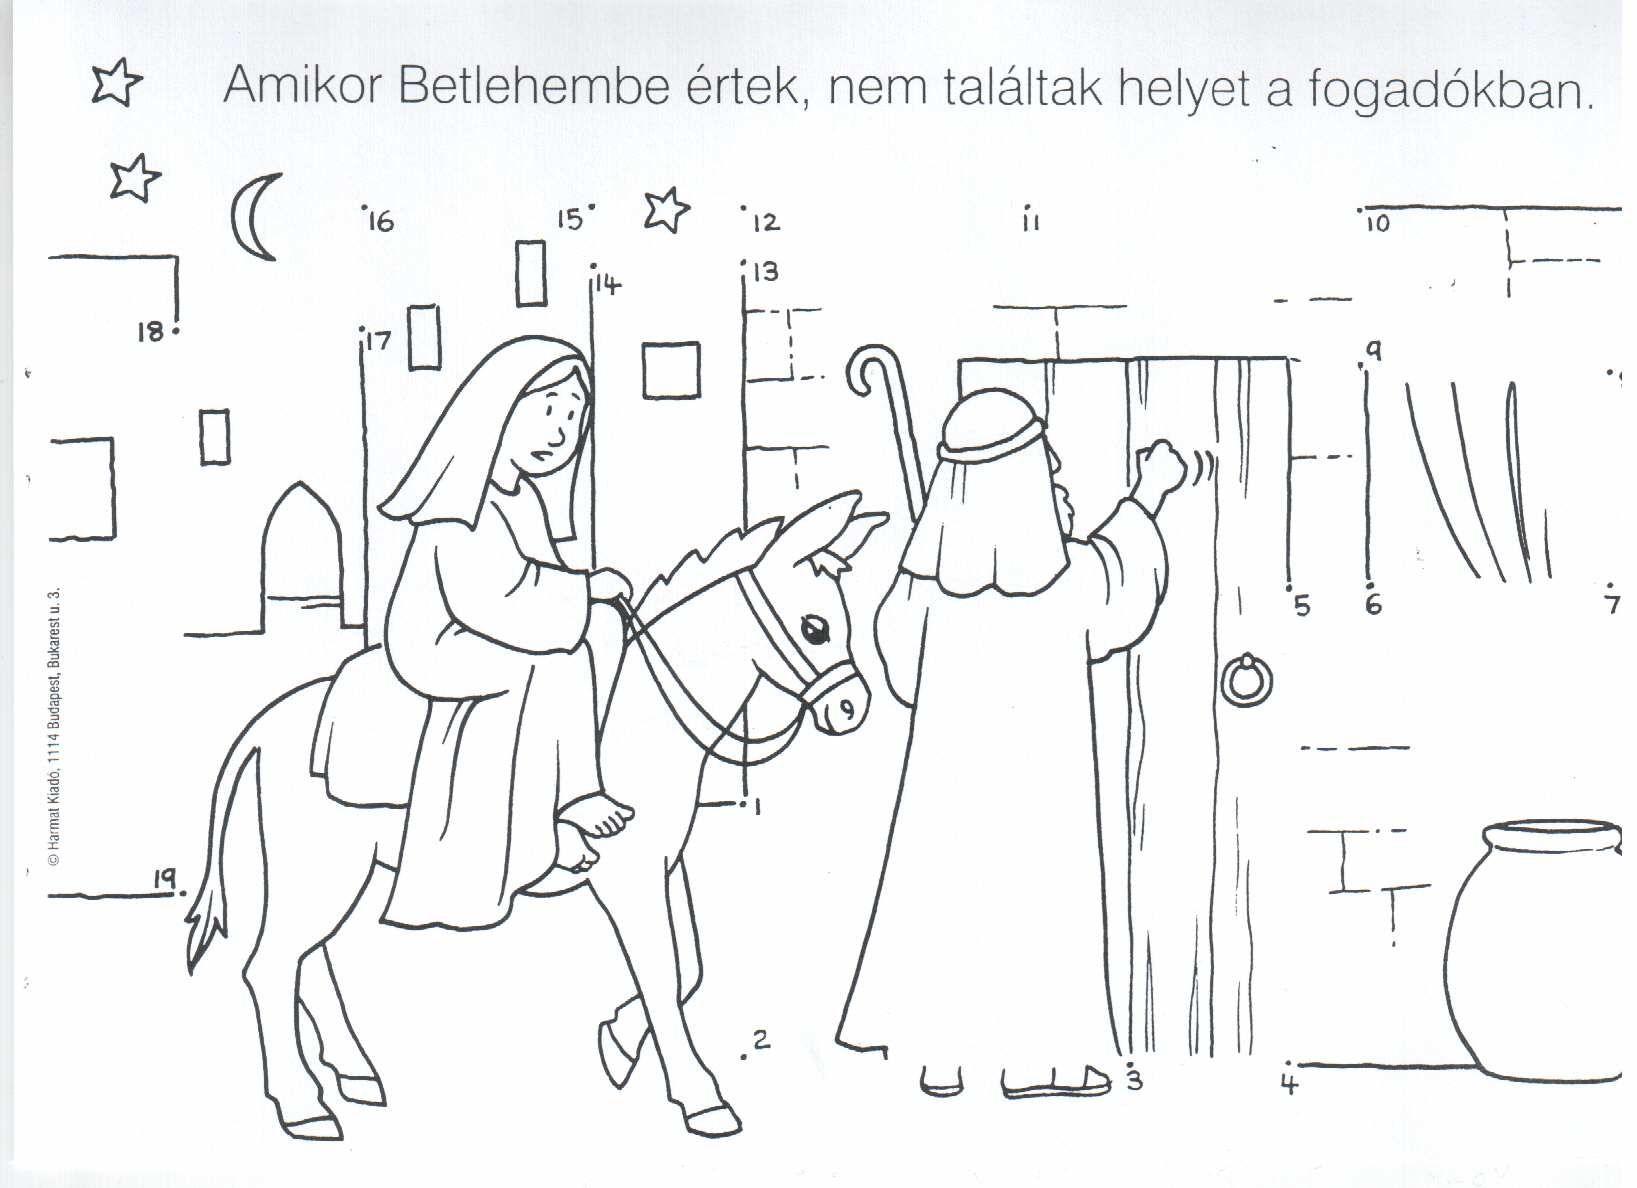 Jezus Szuletese 07 Jpg 1637 1188 Coloring Pages A Christmas Story Printable Image